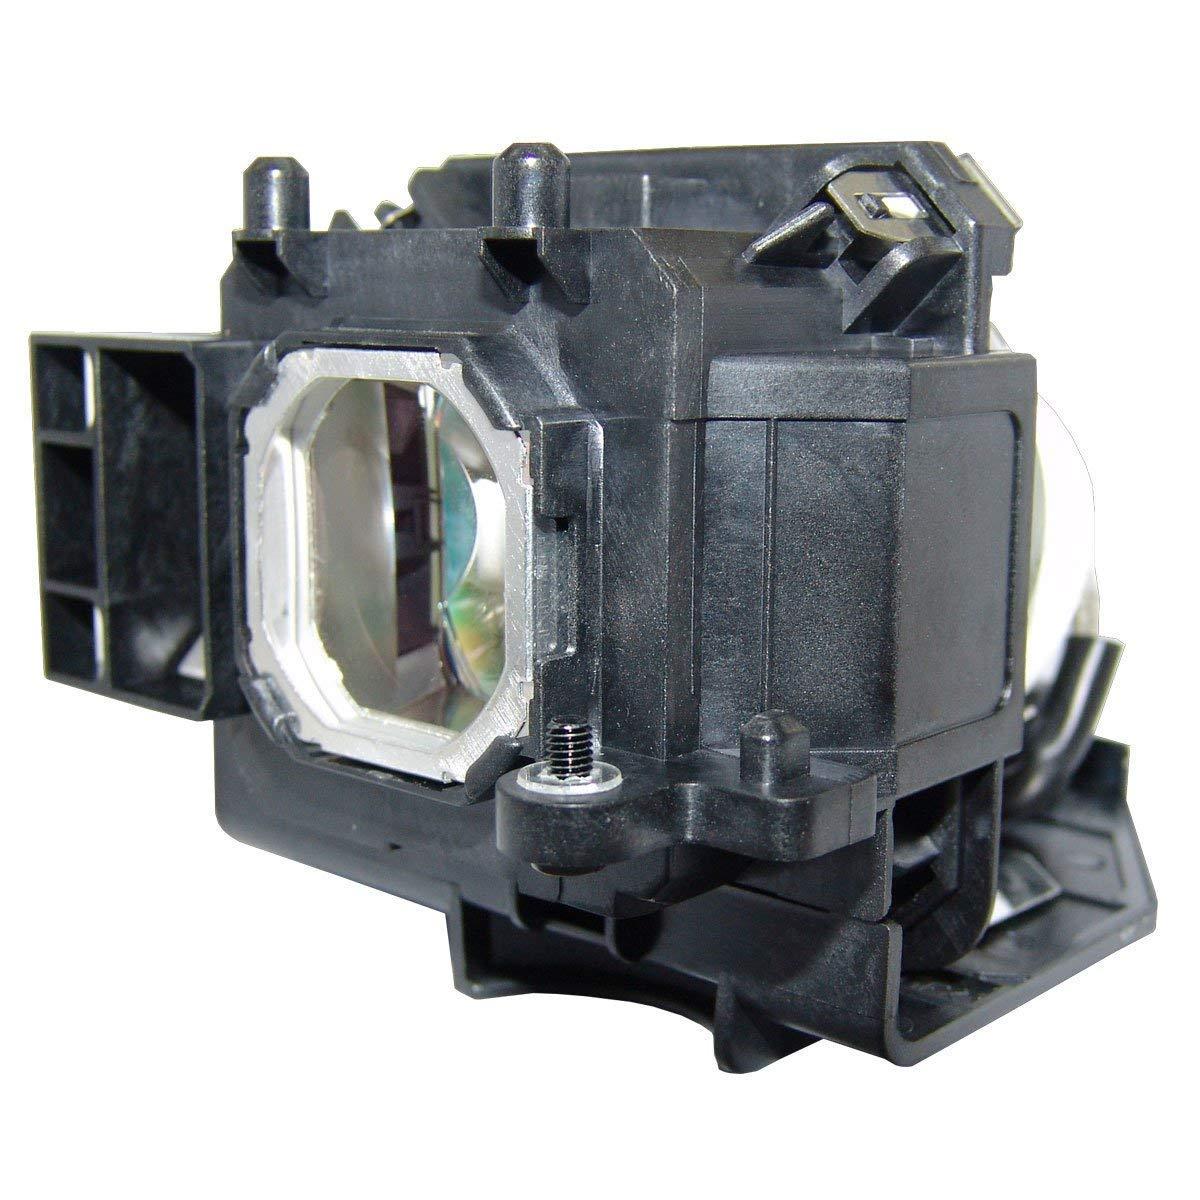 NEC NP17LP Projector lamp - for NEC M300WS M350XS M420X M420XV P350W P420X [並行輸入品]   B07DLM7JD9